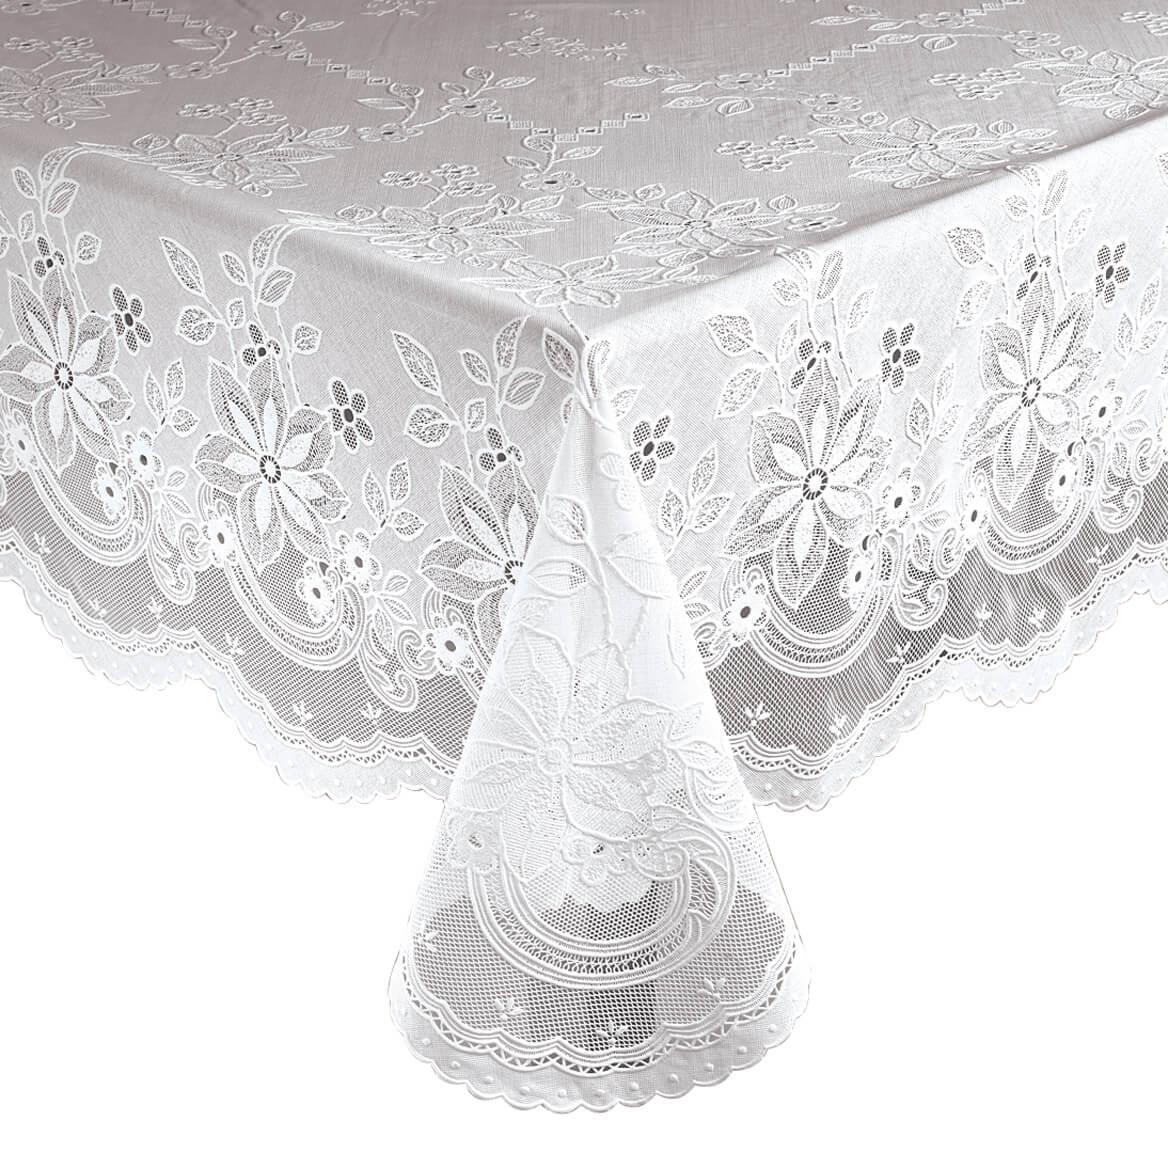 Vinyl Lace Tablecloth 344554 ...